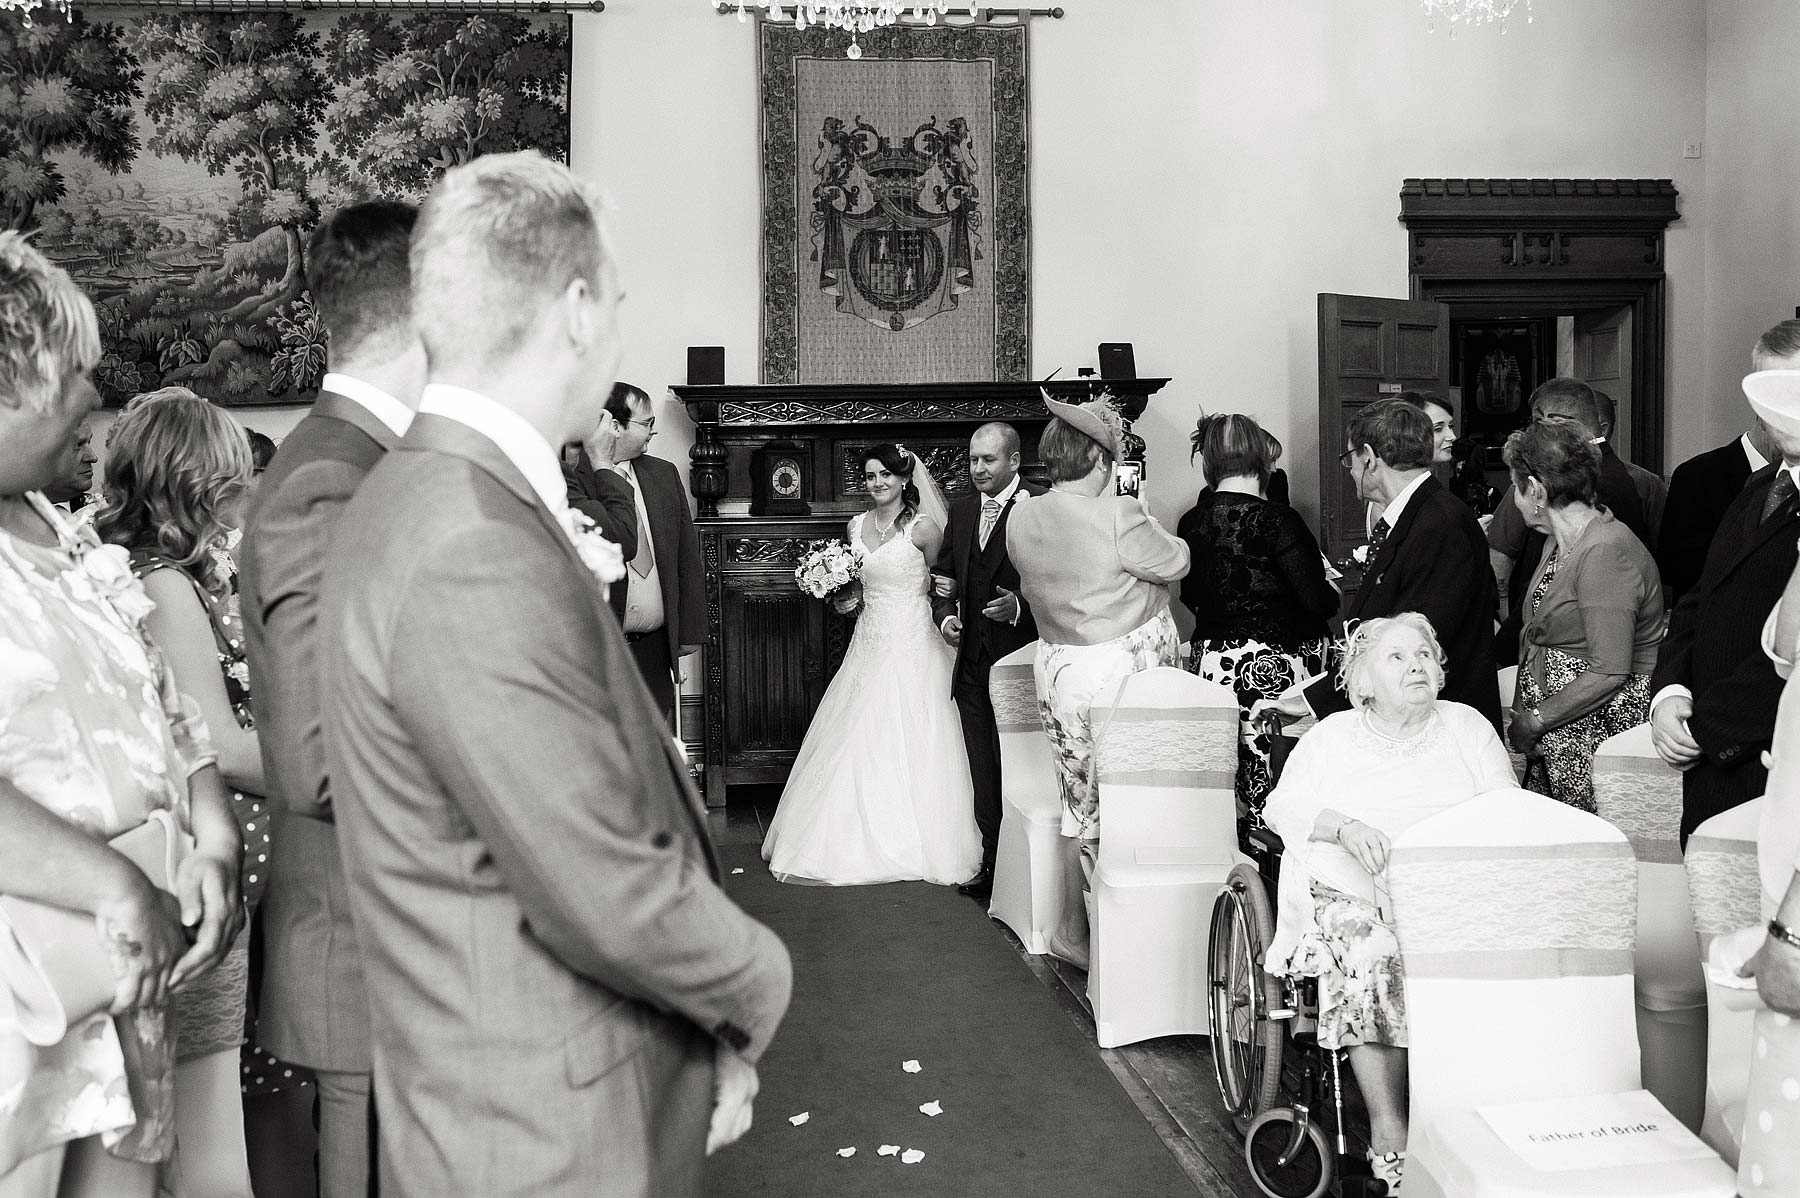 hawkesyard-estate-wedding-photographers-rugeley-029